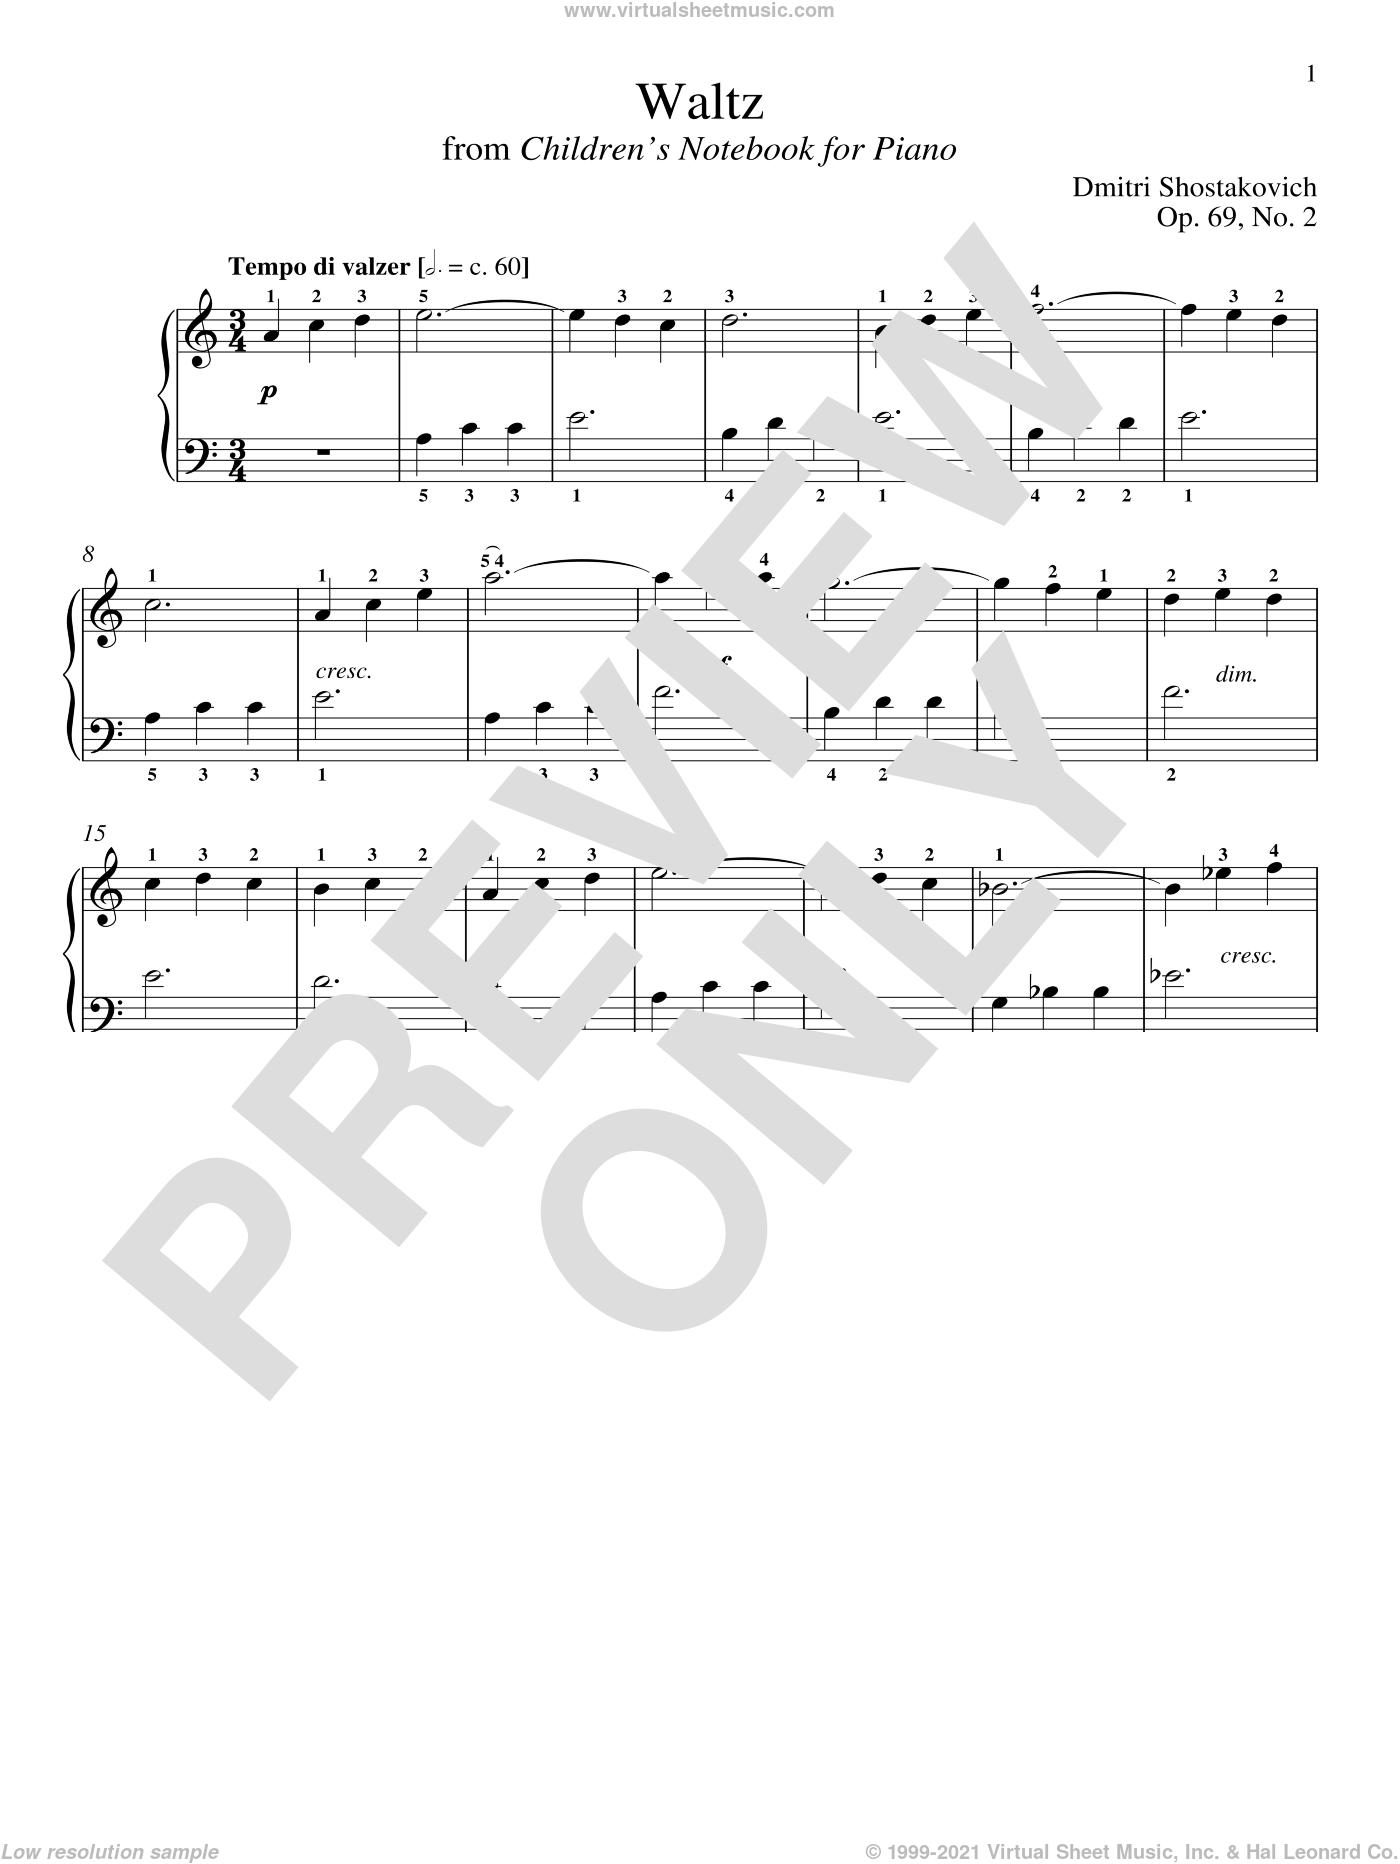 Waltz, Op. 69, No. 2 sheet music for piano solo by Dmitri Shostakovich and Richard Walters, classical score, intermediate skill level